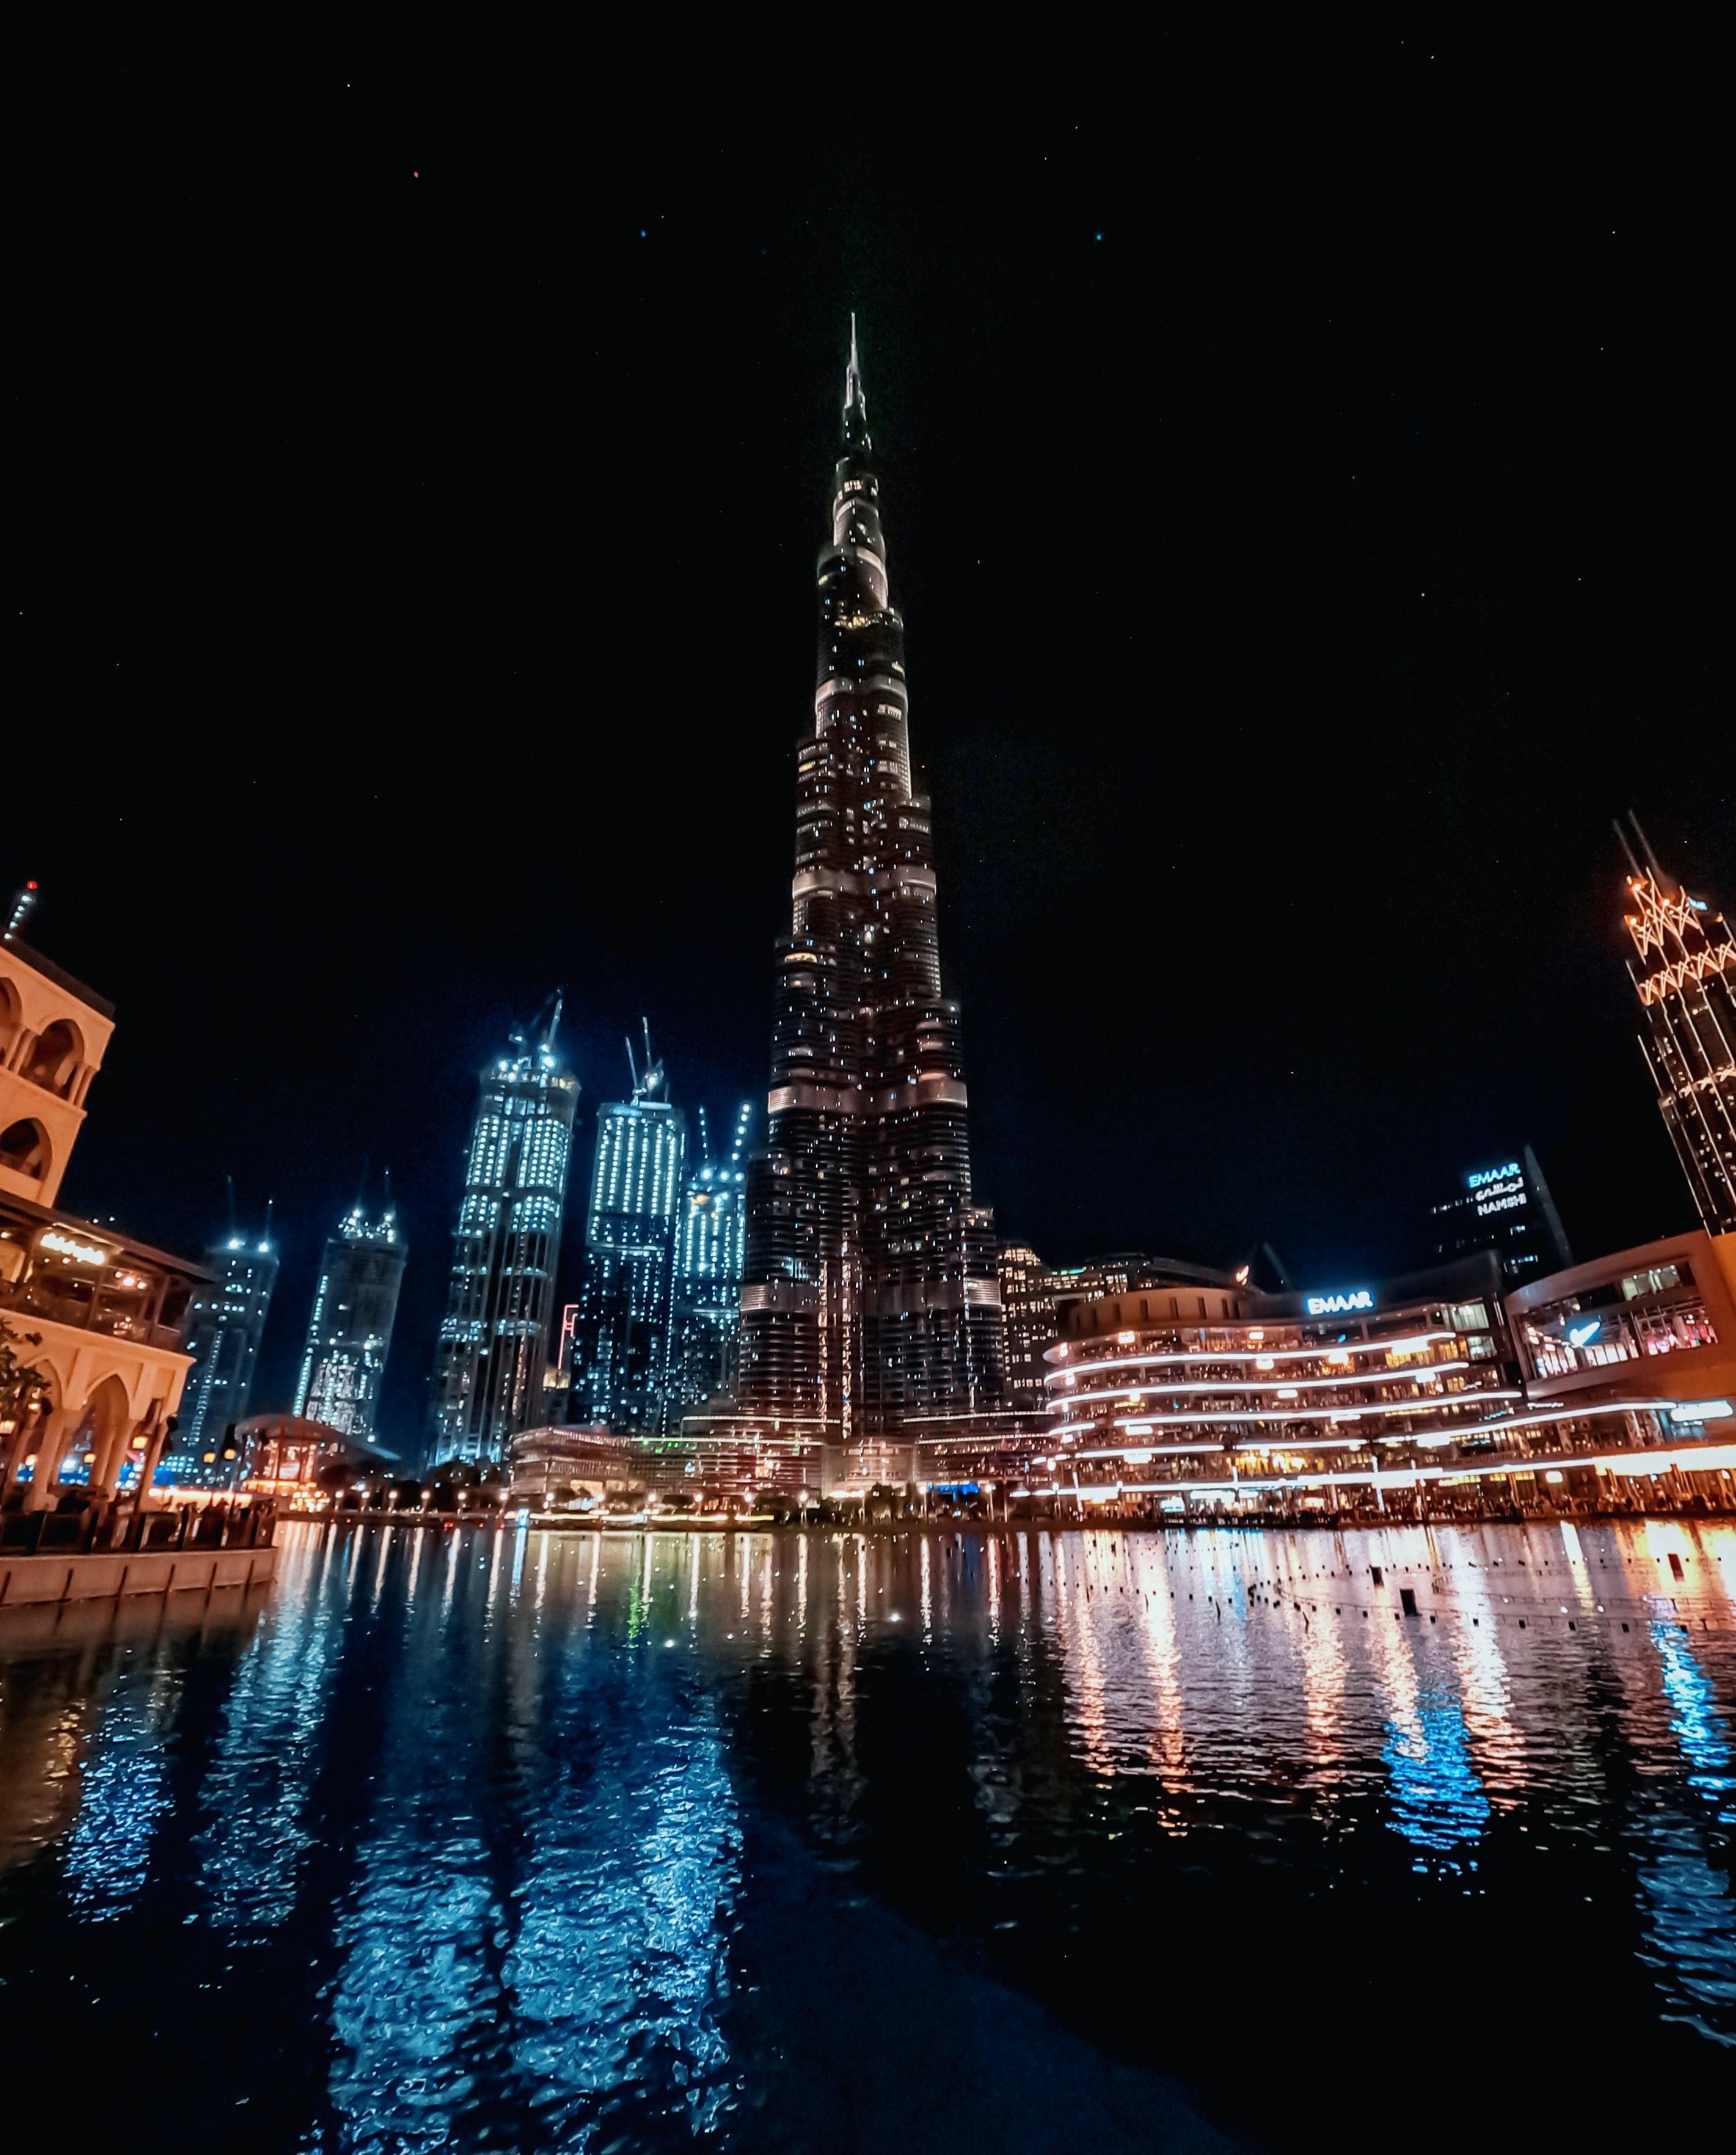 Best Places to Visit in Dubai - Burj khalifa - 1